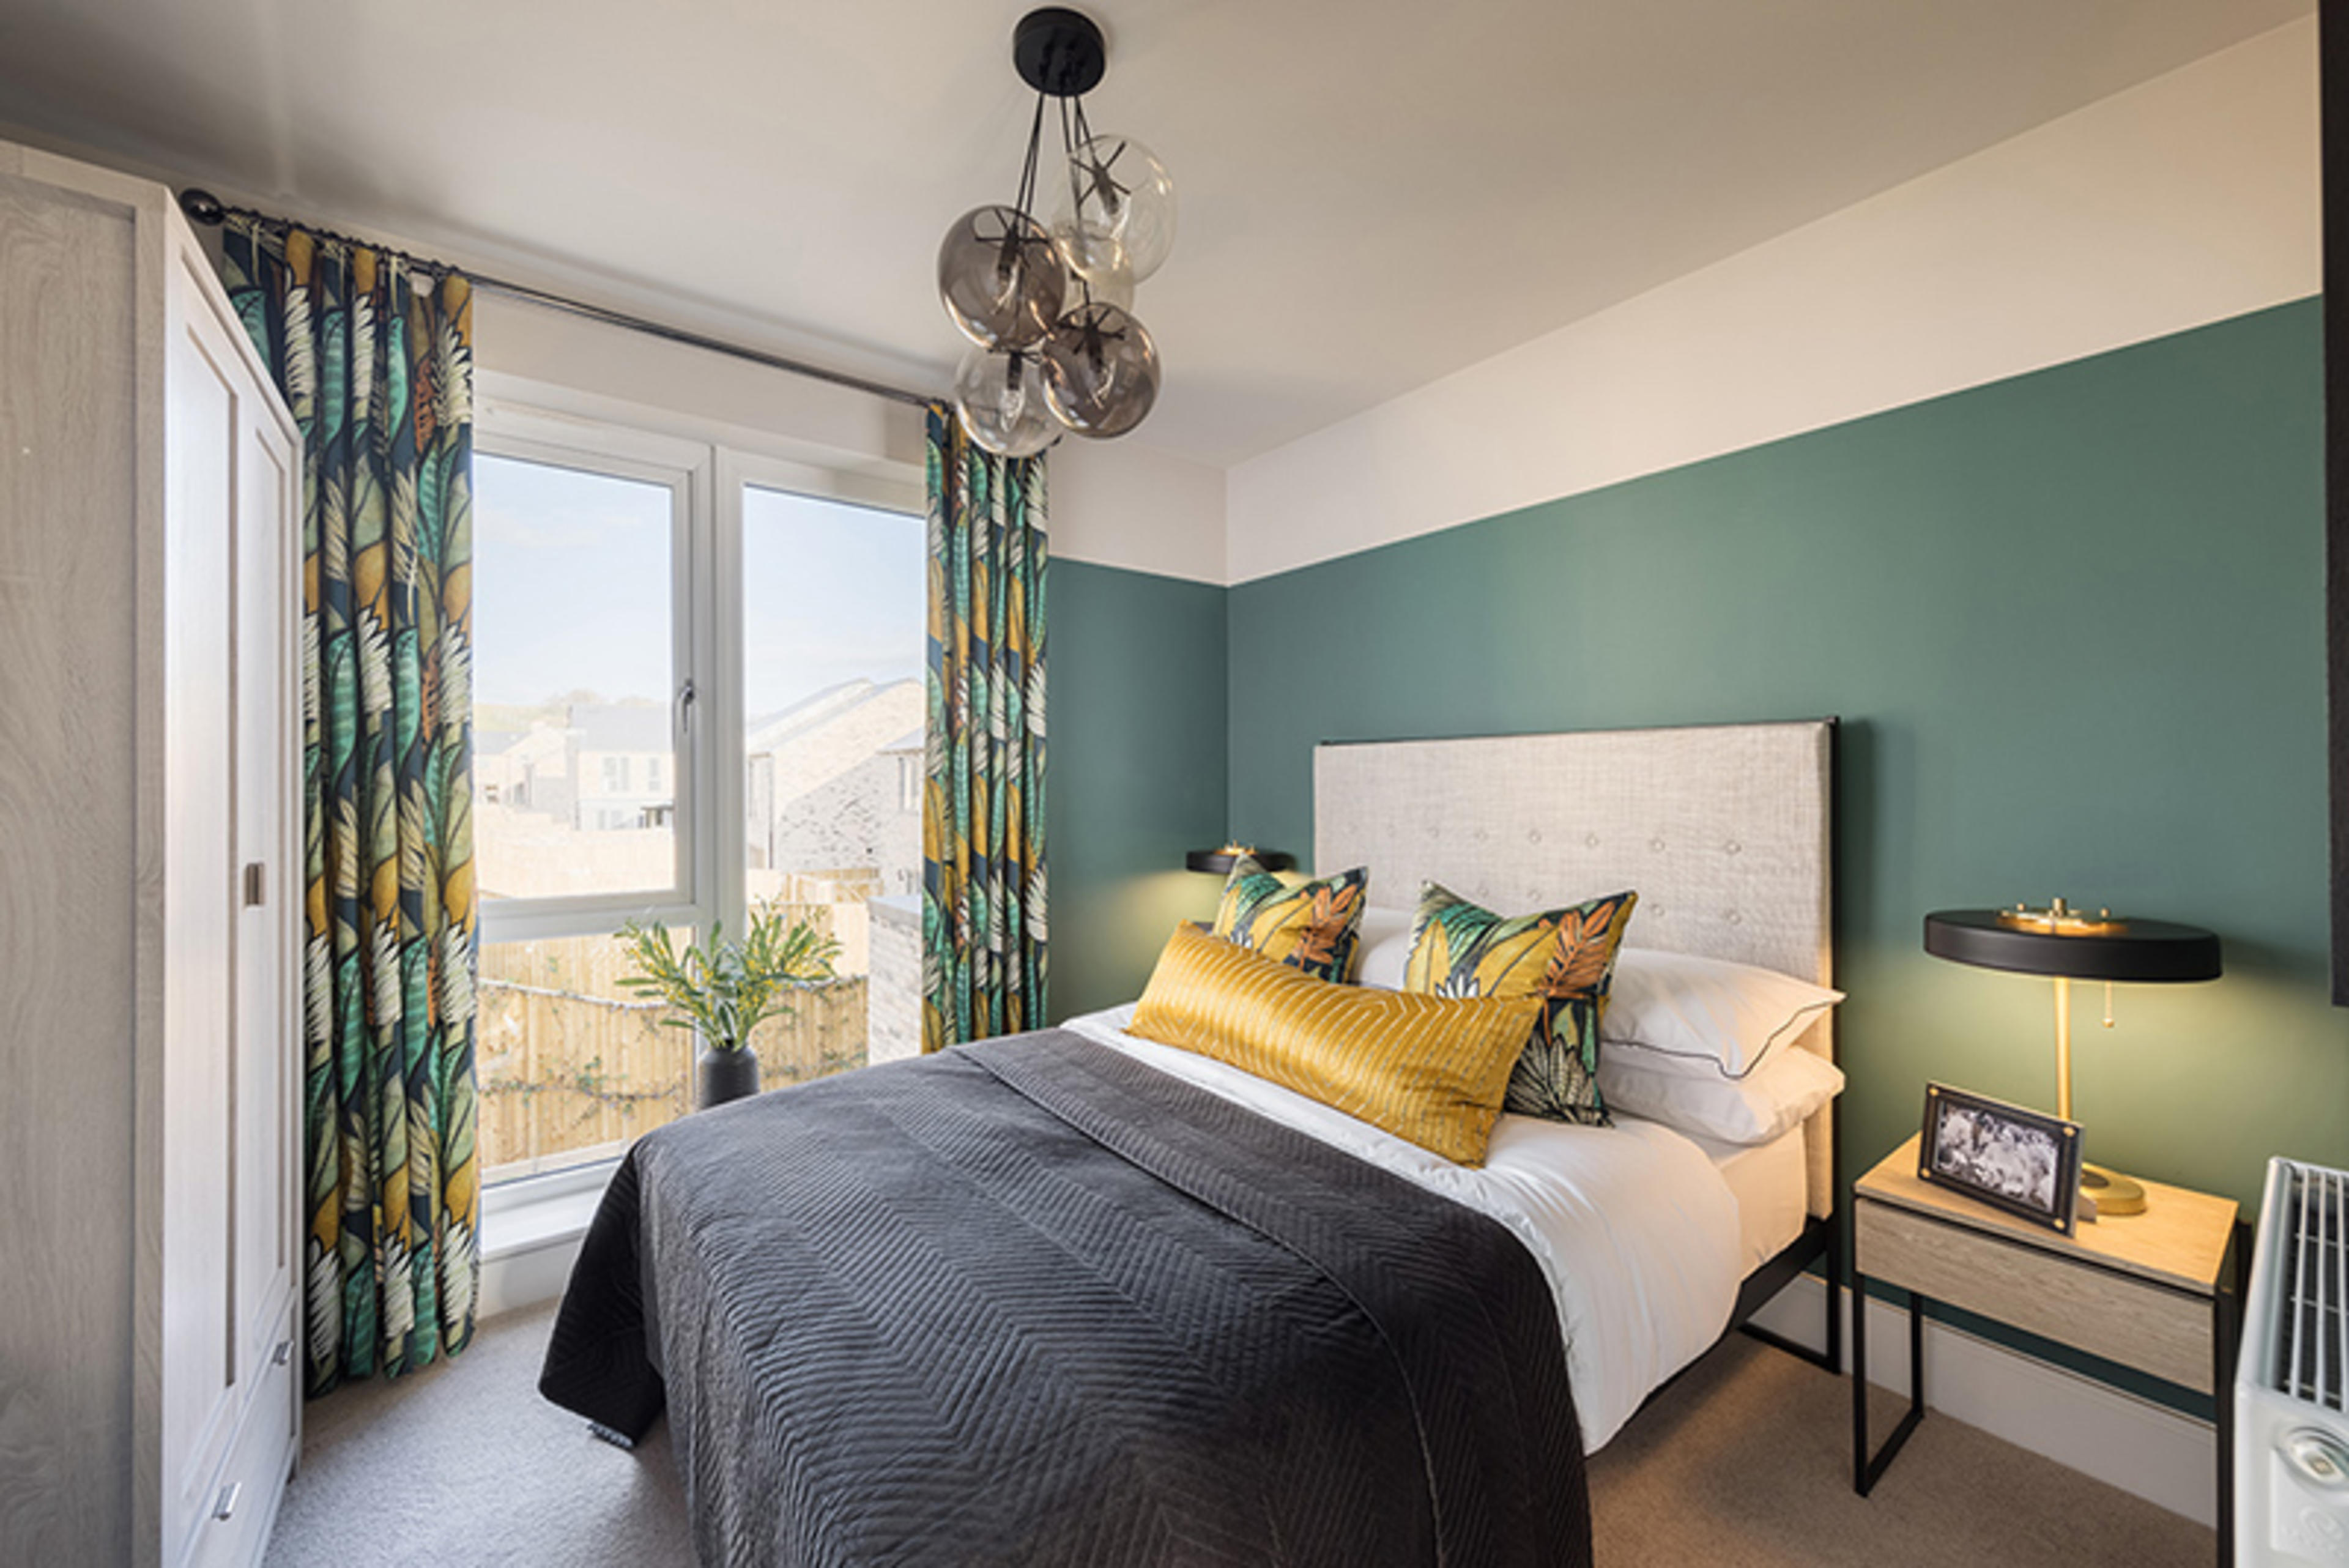 watling-grange-harrogate-easby-3-bed-home-double-bedroom-1